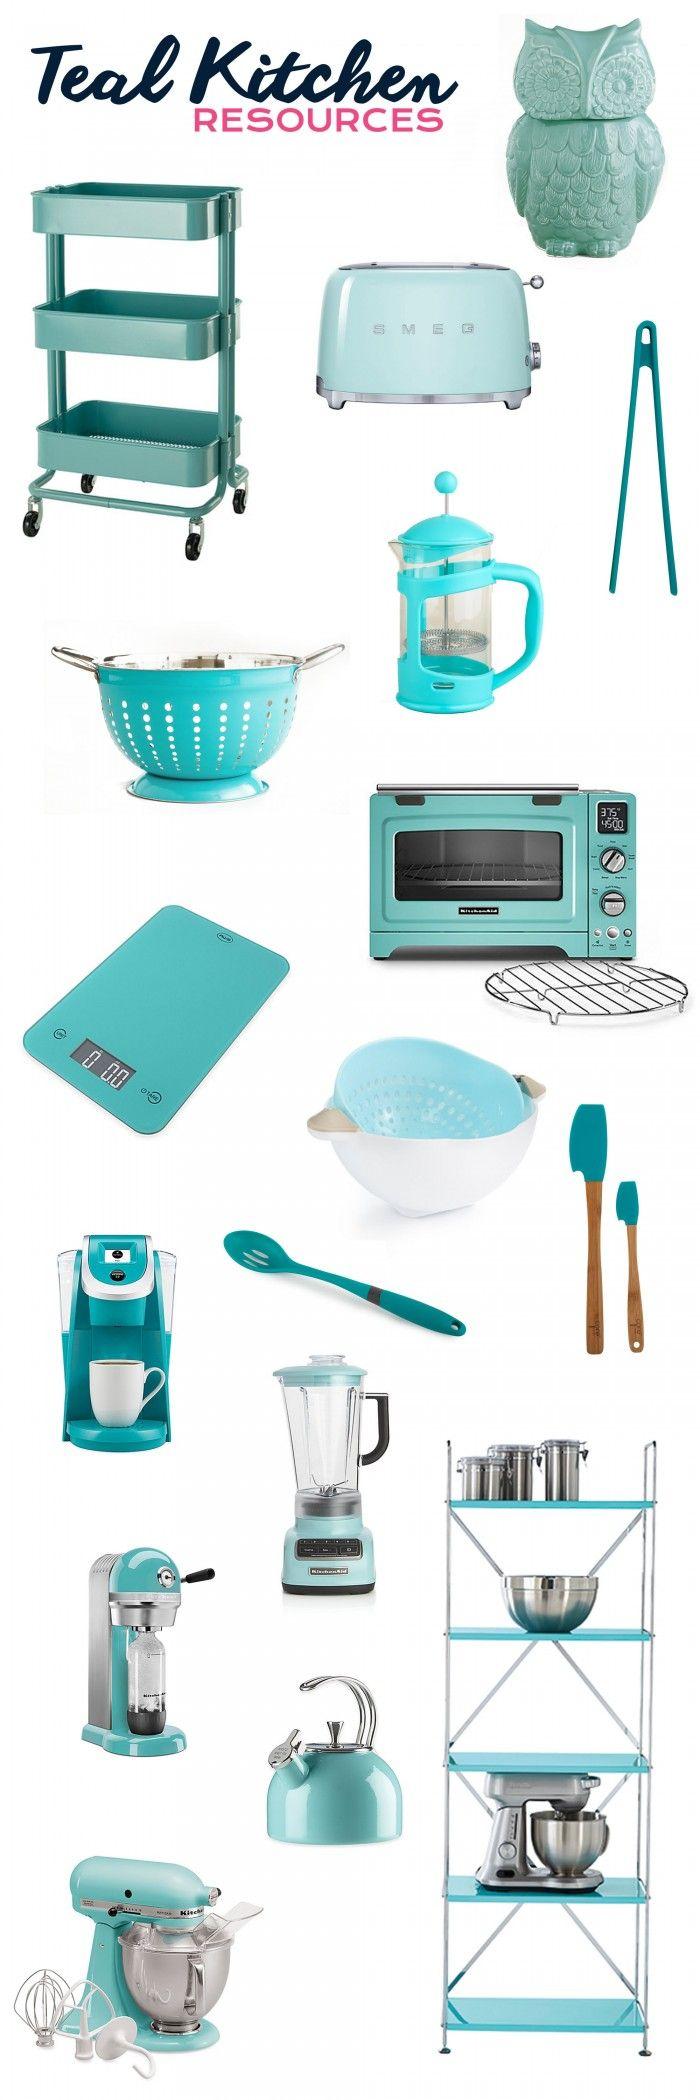 5236 best Appliances images on Pinterest | Kitchen utensils, Cooking ...